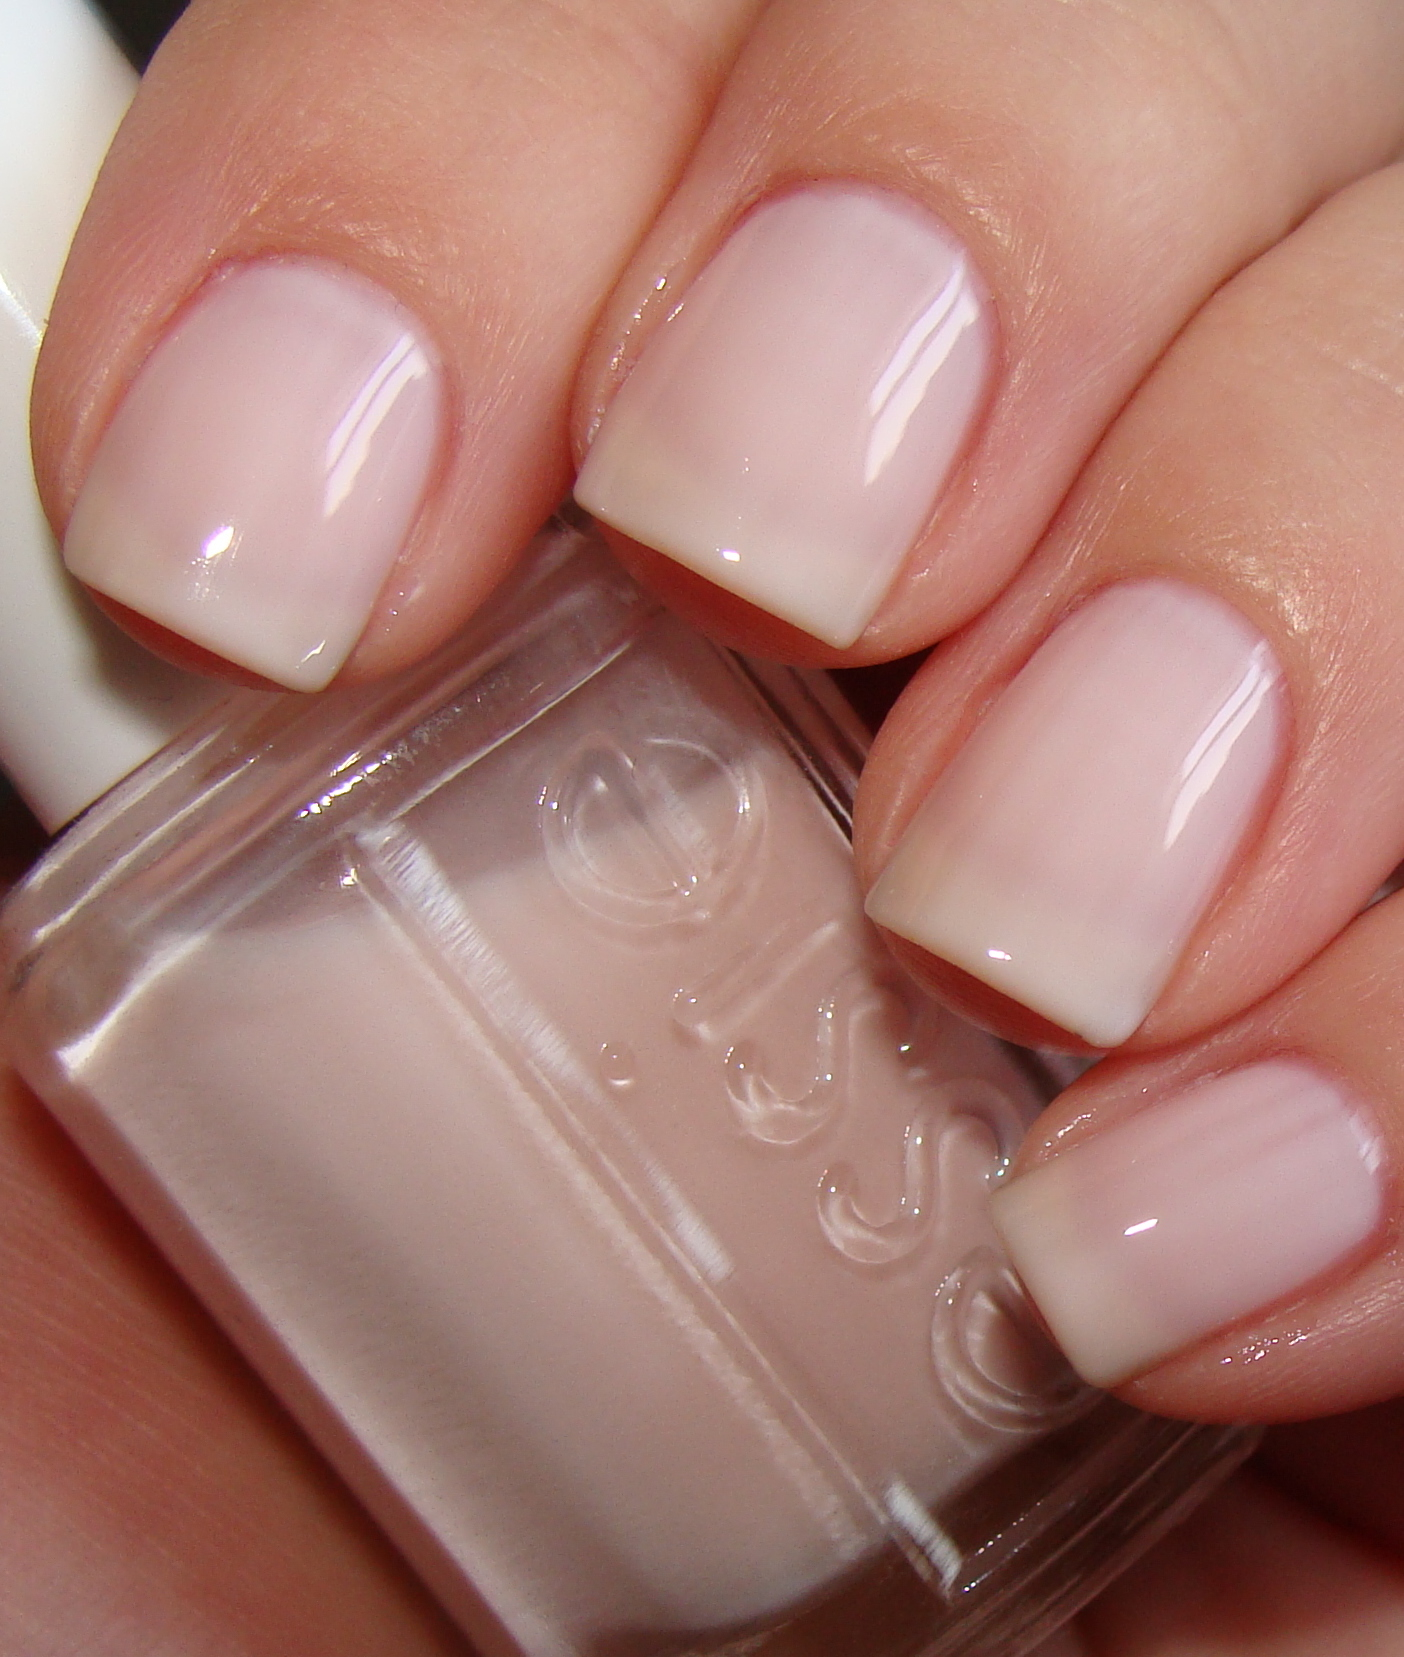 Best Light Pink Nail Polish Essie: Best Pale Pink Essie Colors?